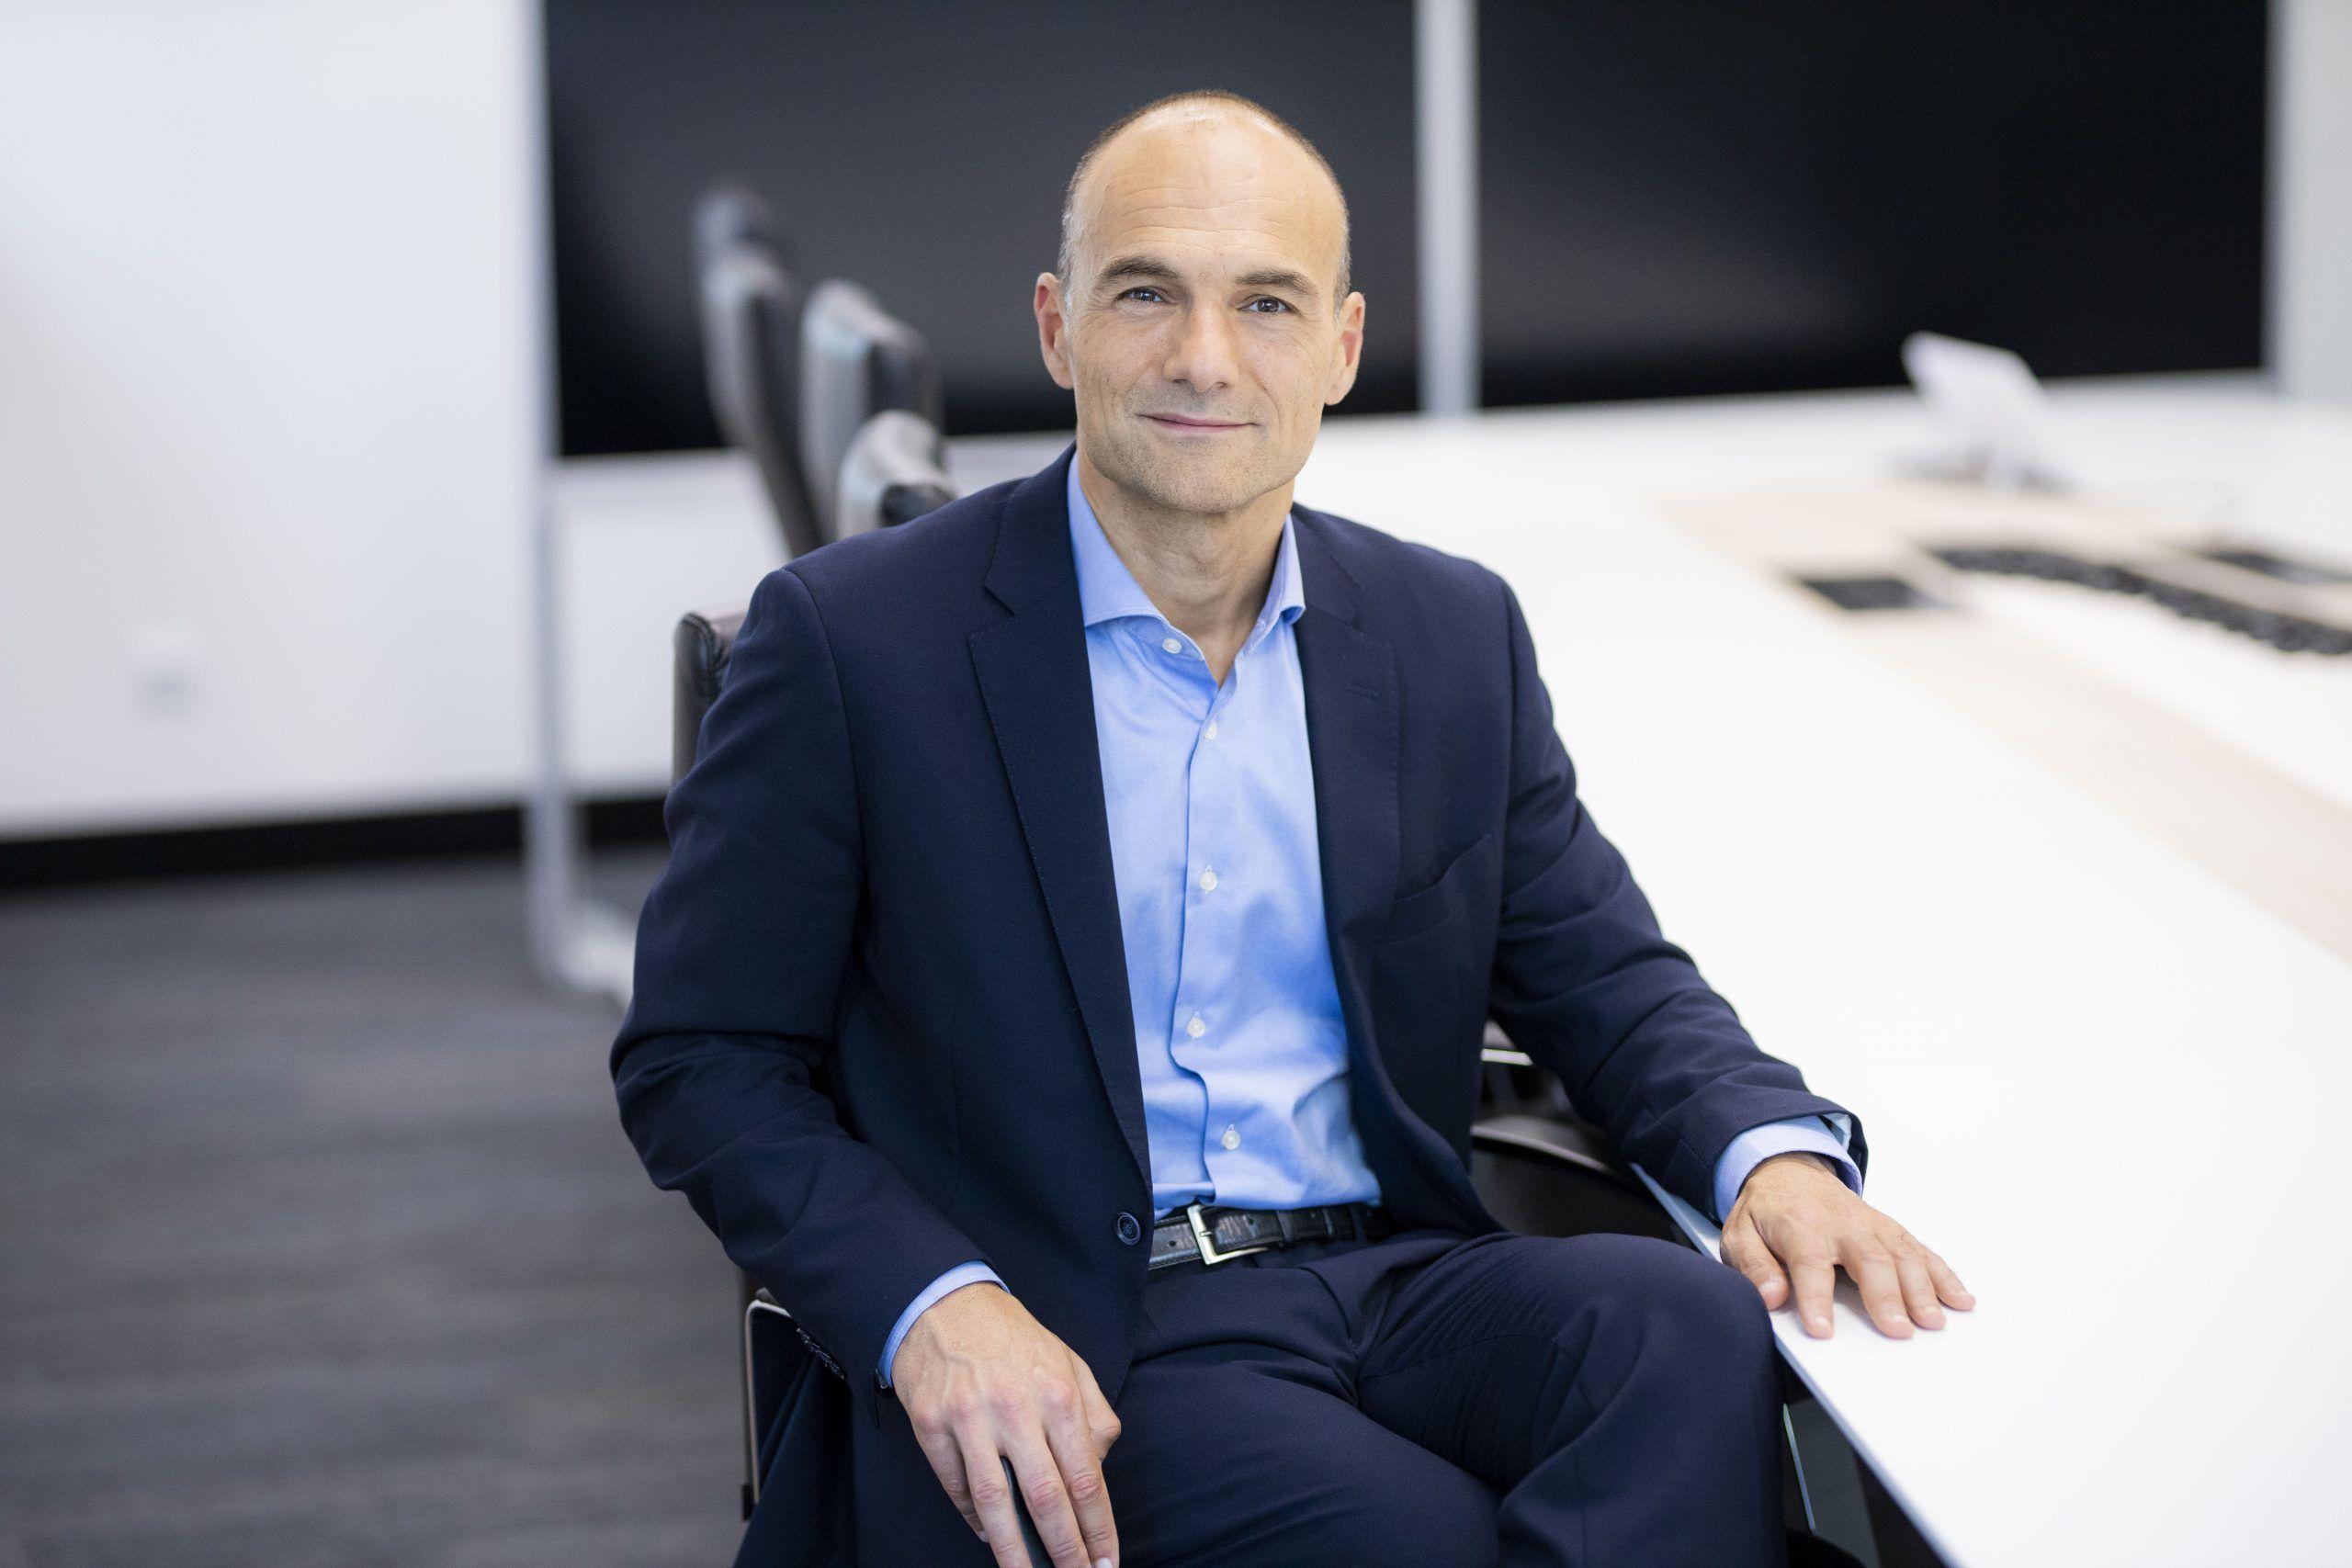 Miguel-Teixeira-CEO-de-everis-Chile-scaled.jpg